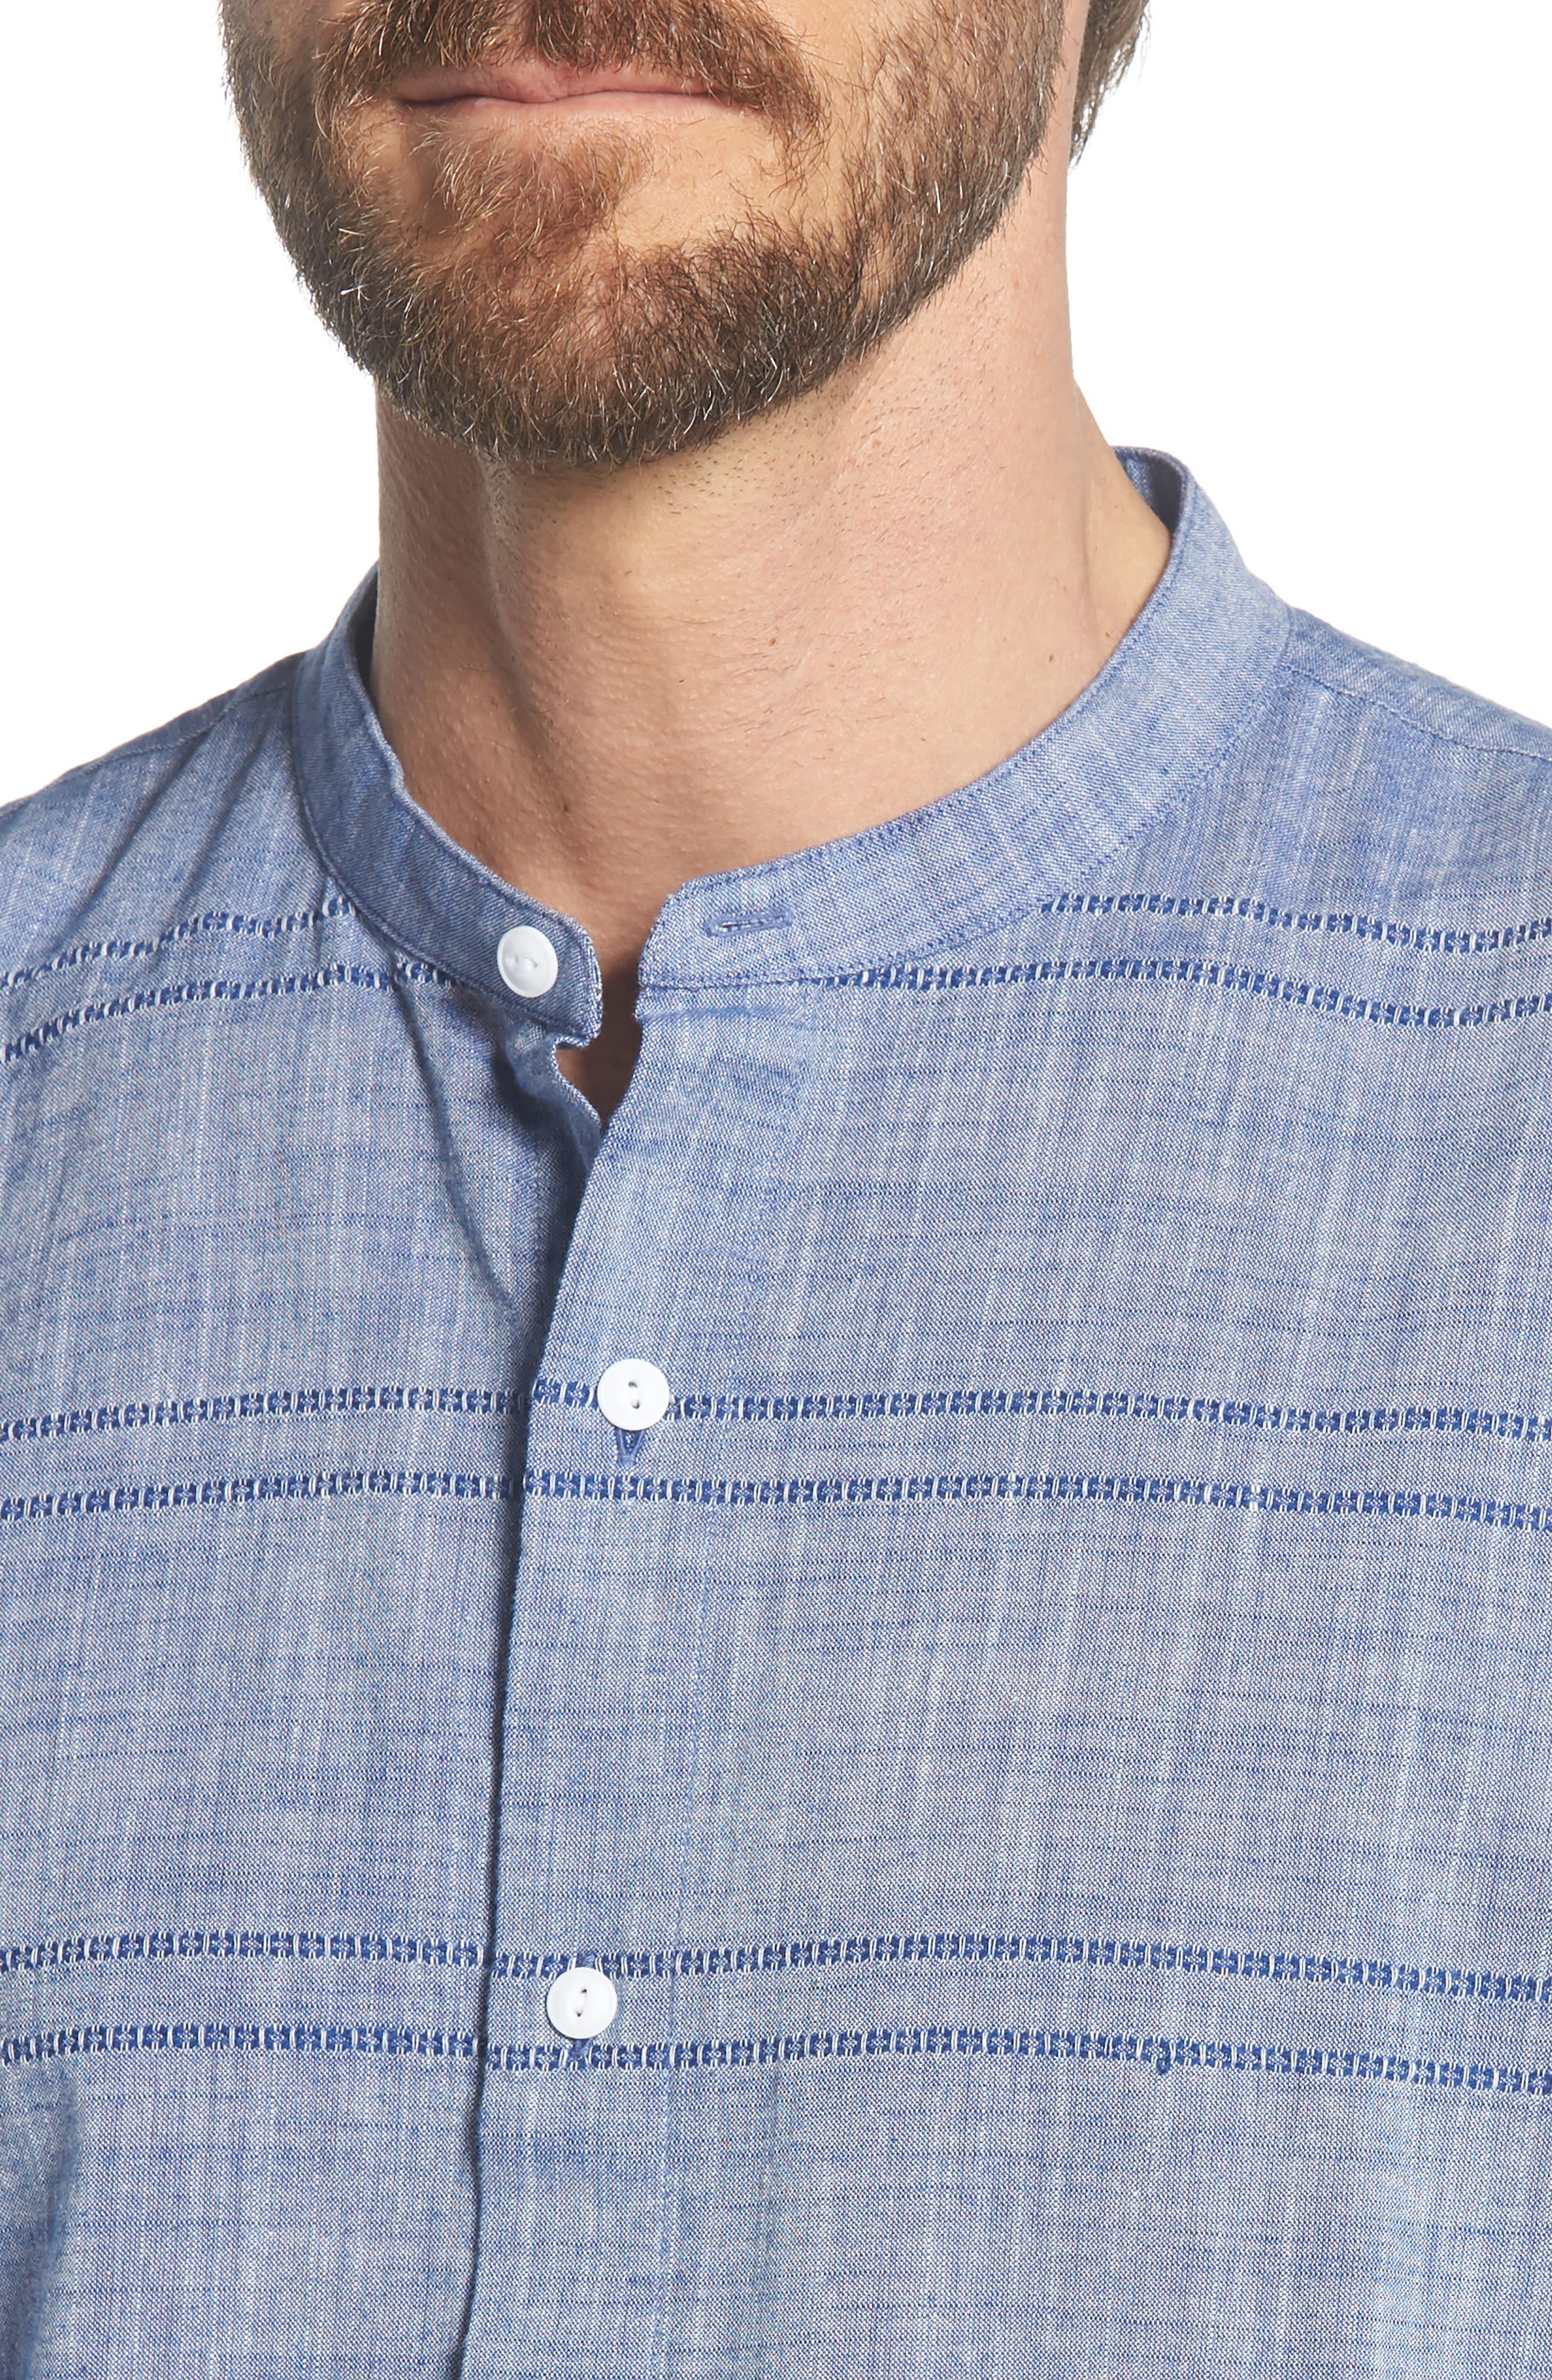 Beach Slim Fit Stripe Sport Shirt,                             Alternate thumbnail 2, color,                             Oak Bluffs Awning - Blue